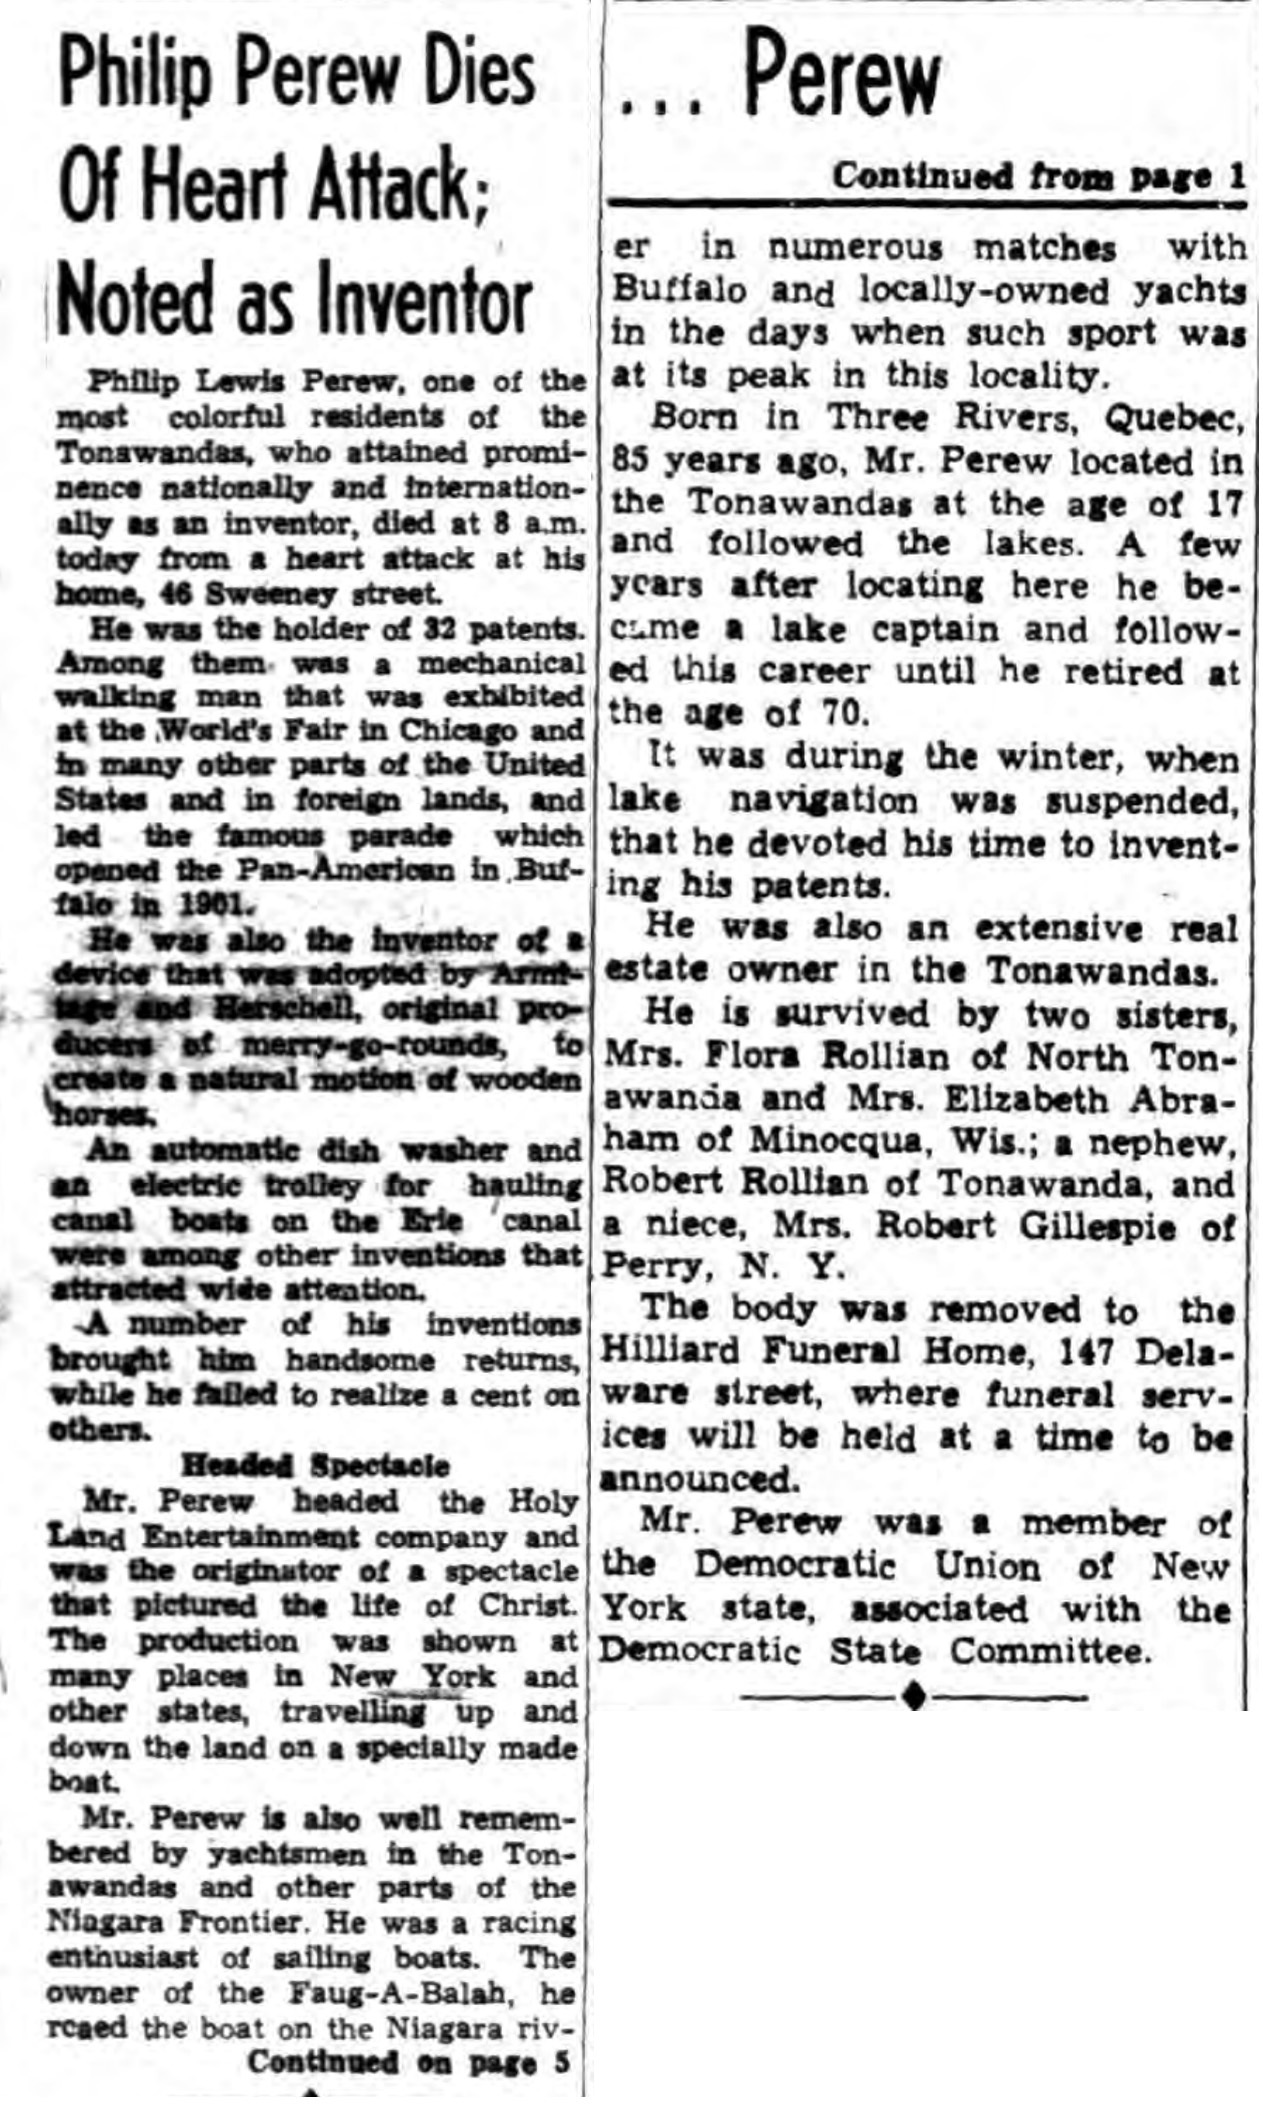 Philip Perew Dies of Heart Attack, obit (Tonawanda News, 1946-12-07).jpg